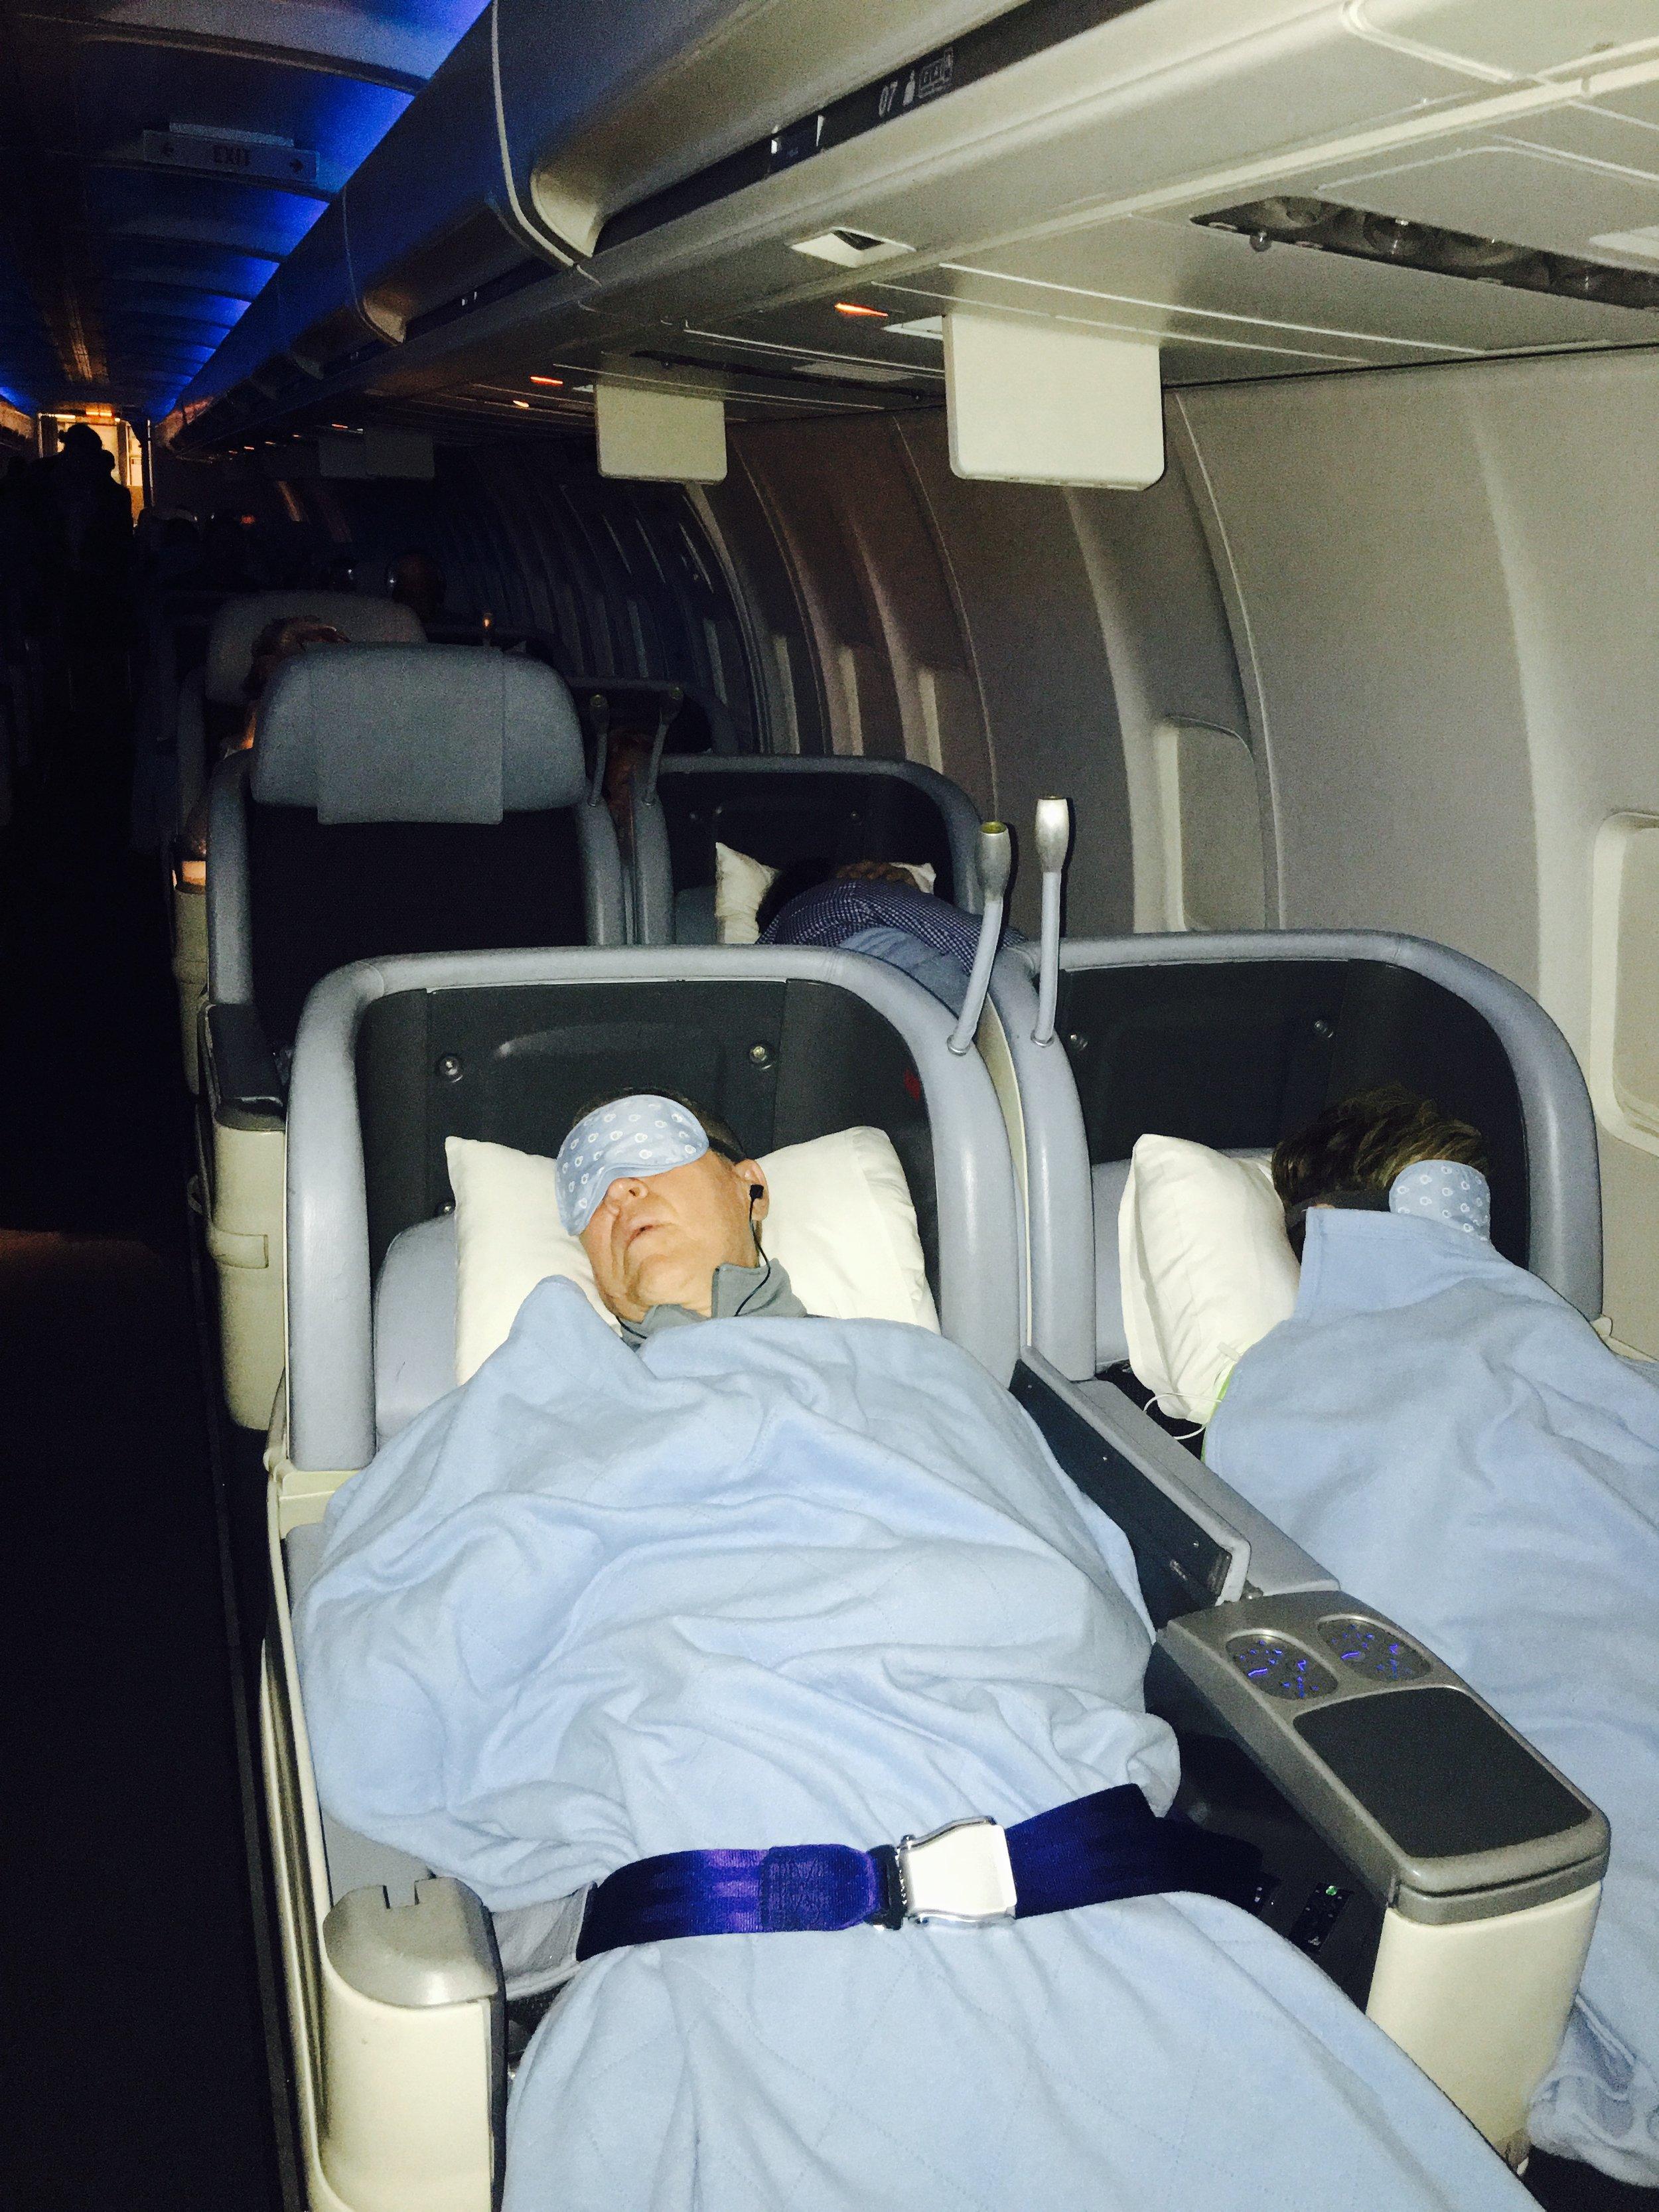 La Compagnie - Comfortable Seat Bed